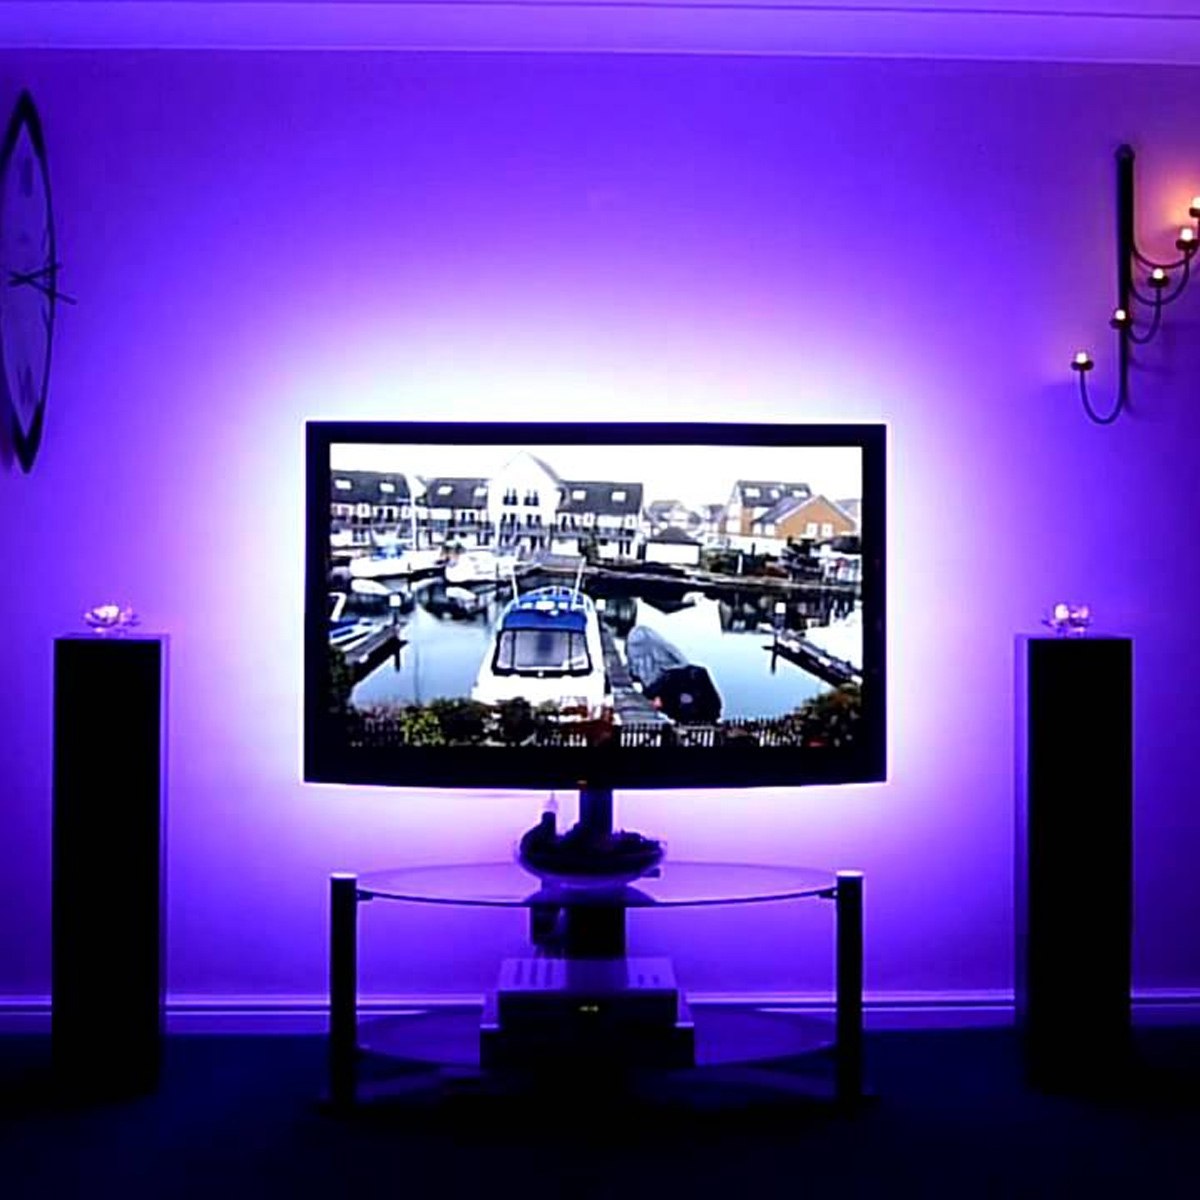 2x Led Tv Usb Backlight Kit Rgb Light Strip Computer Tv Background